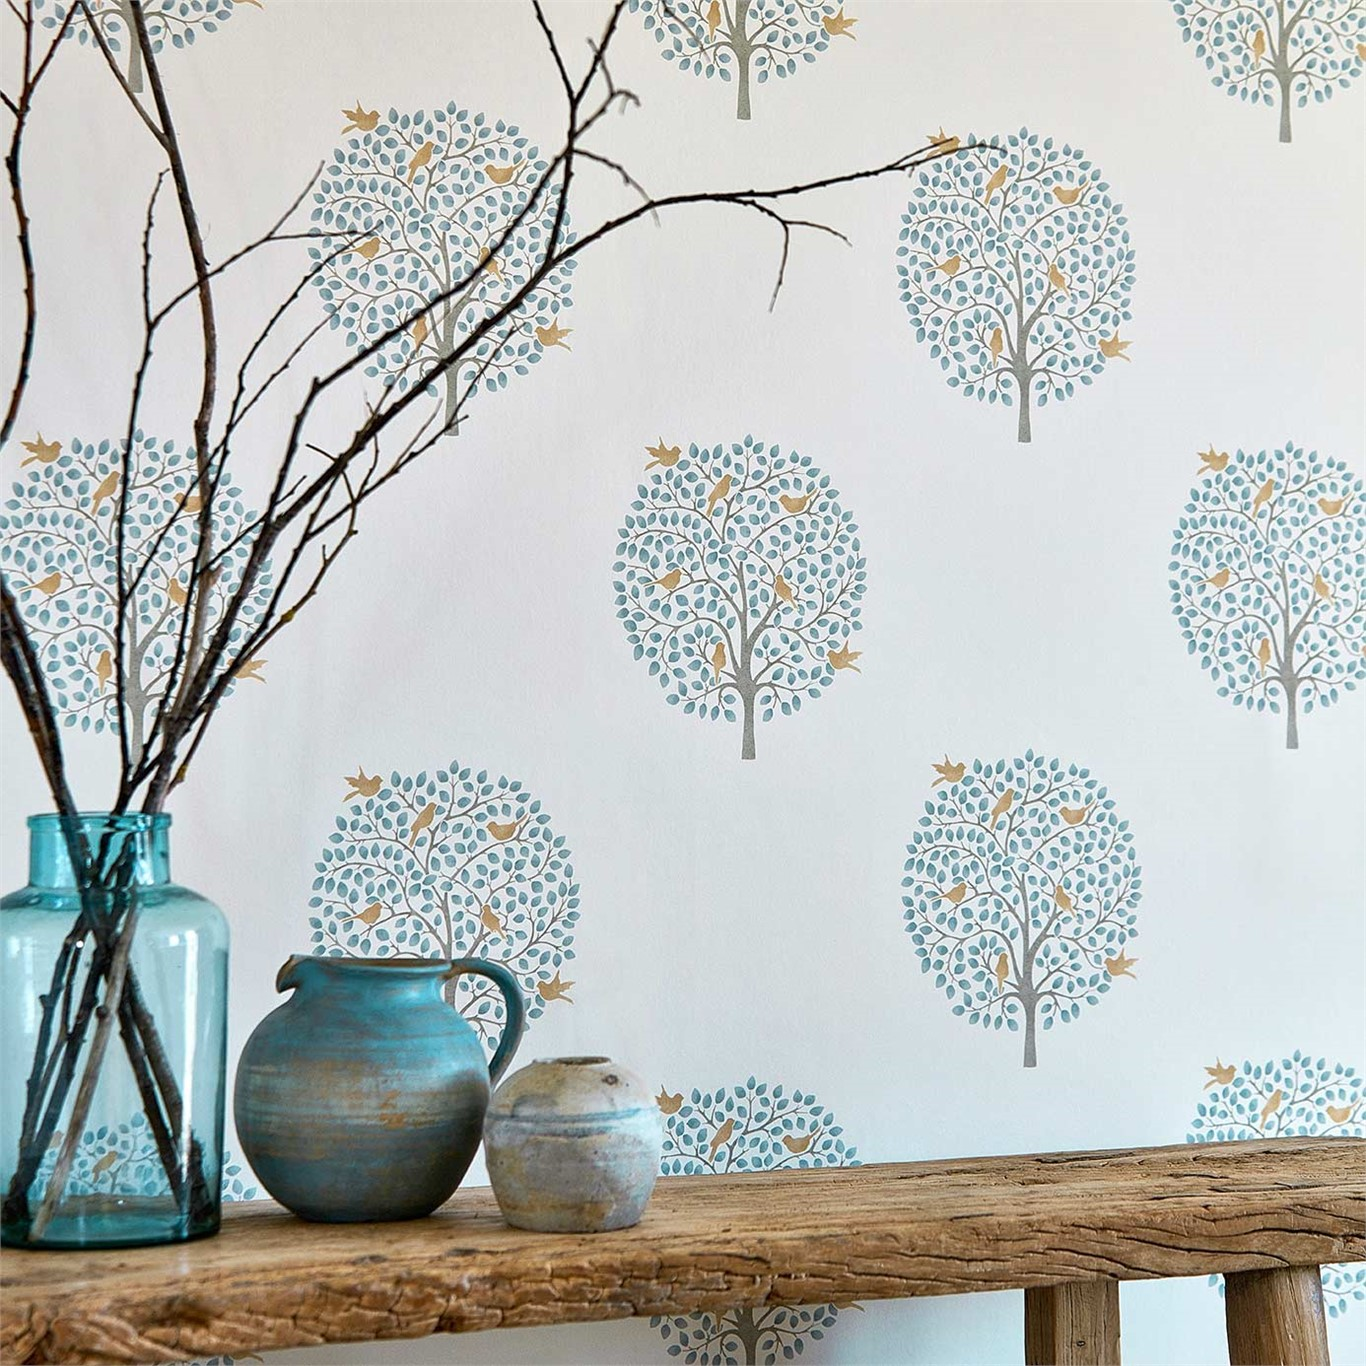 Bay tree sanderson papeles pintados - Papeles pintados sanderson ...